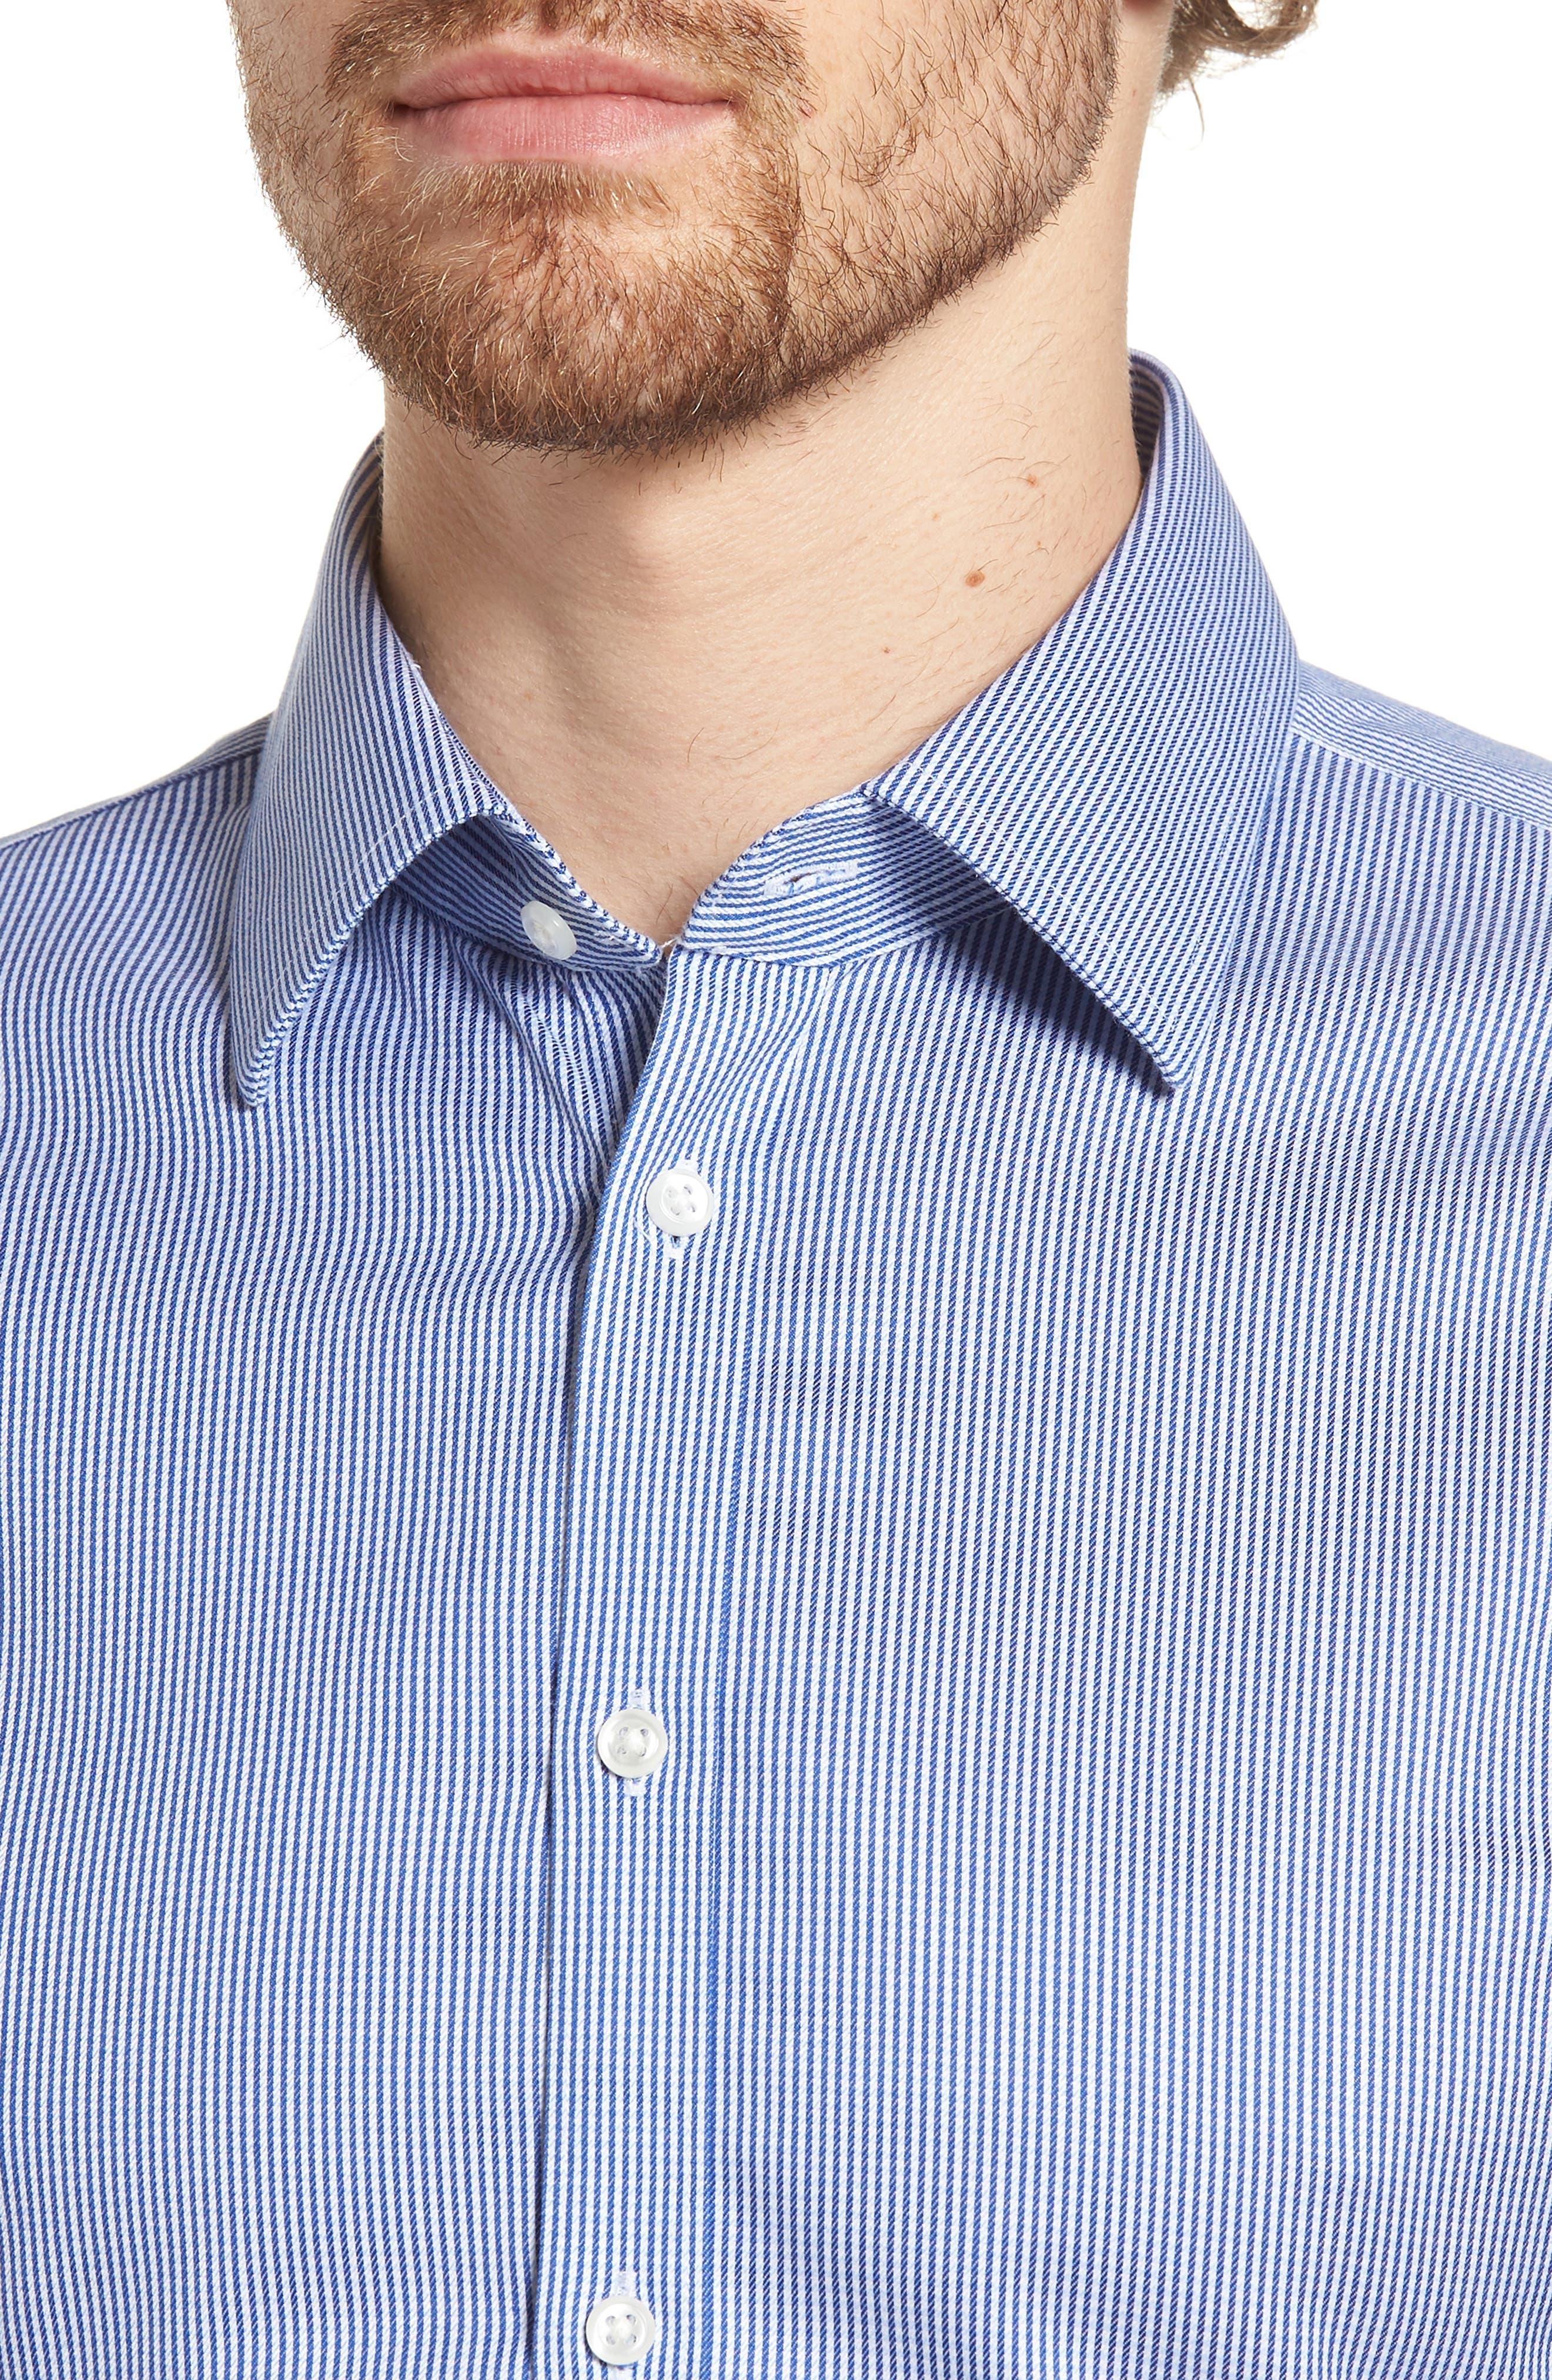 Smartcare<sup>™</sup> Extra Trim Fit Stripe Dress Shirt,                             Alternate thumbnail 2, color,                             Navy Print